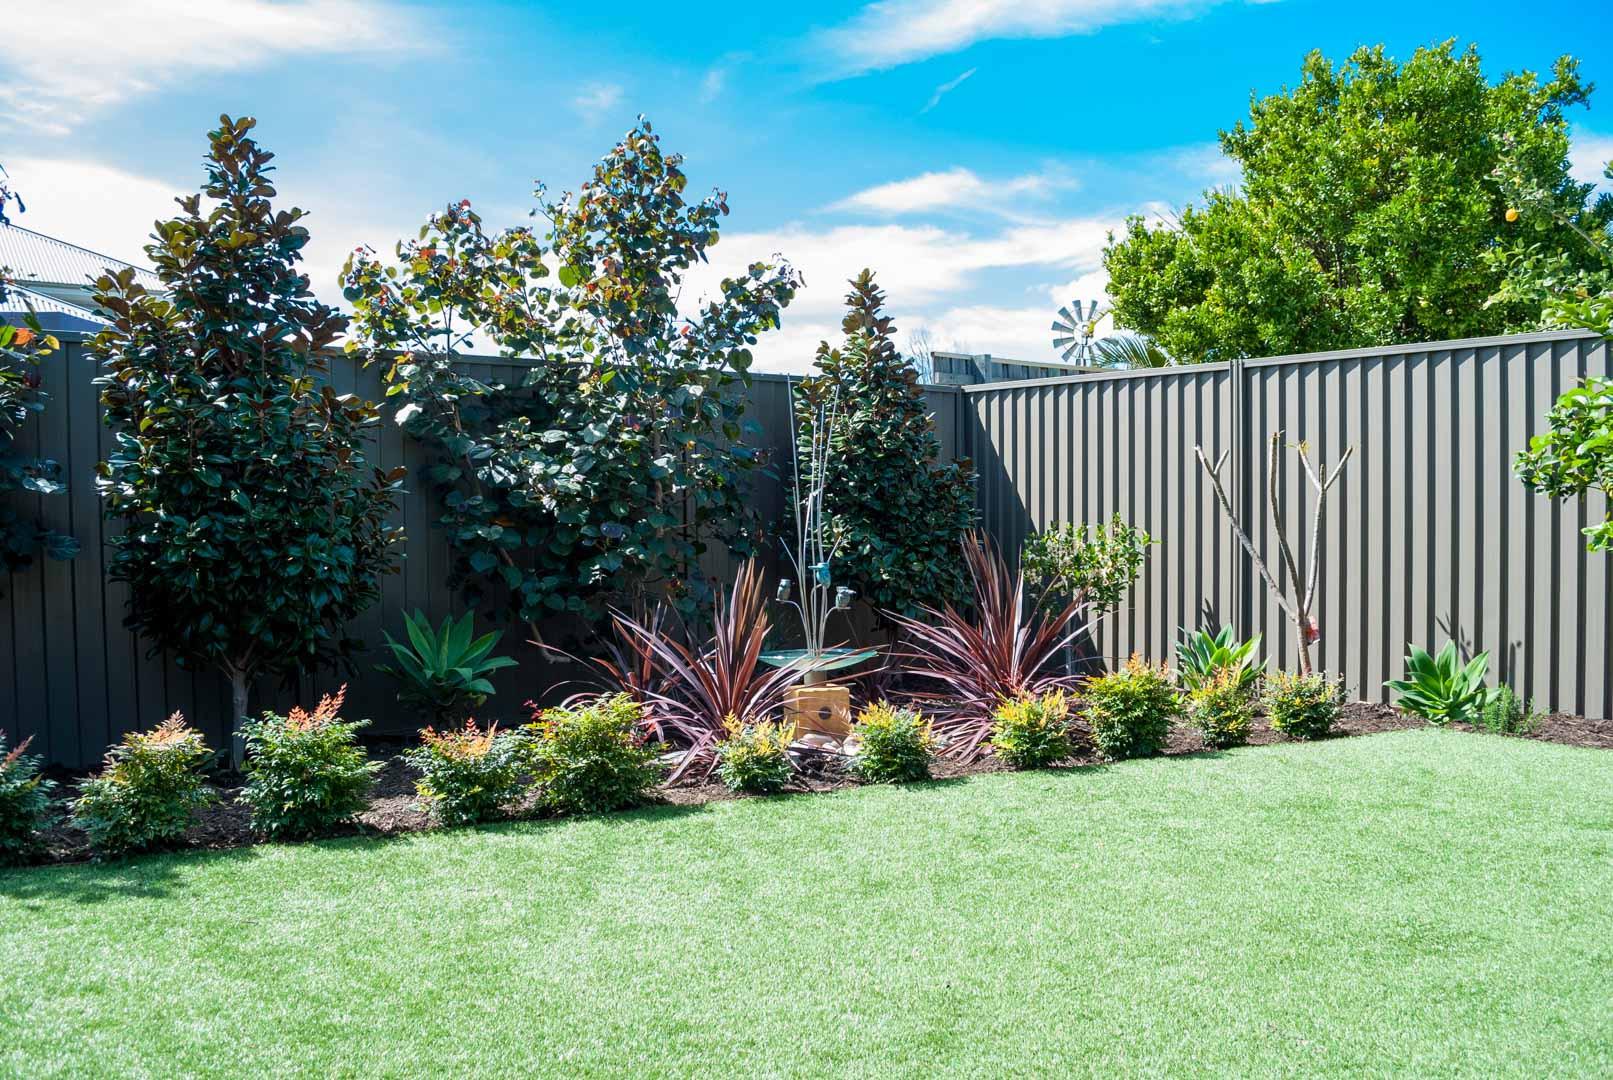 Best ideas about Garden Landscape Ideas . Save or Pin Landscaping Ideas Perth Garden Ideas Now.